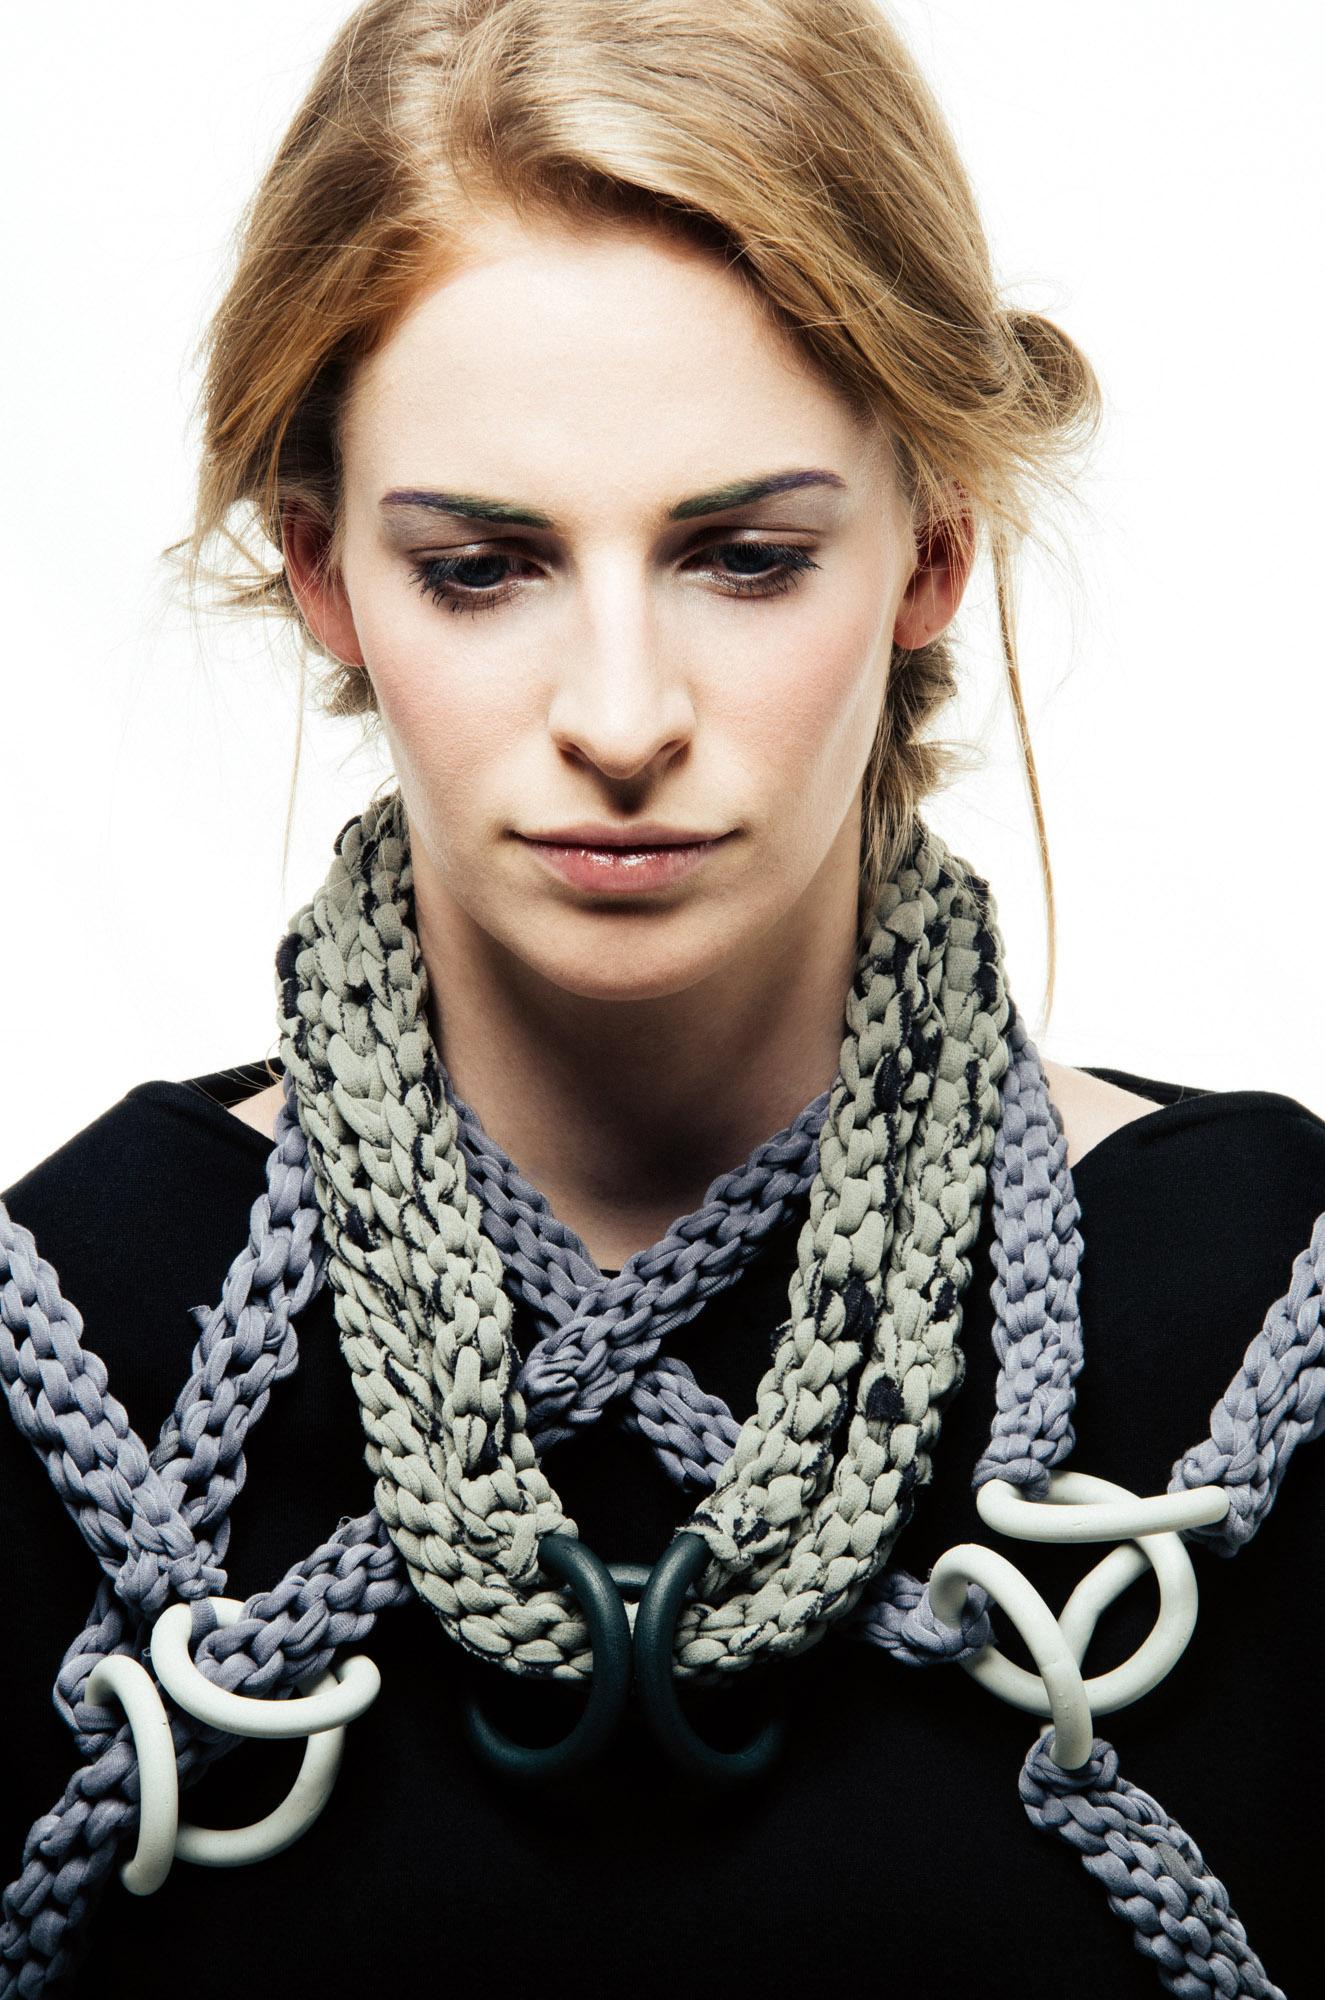 Bocco necklace by Anna Borshi 02.jpg